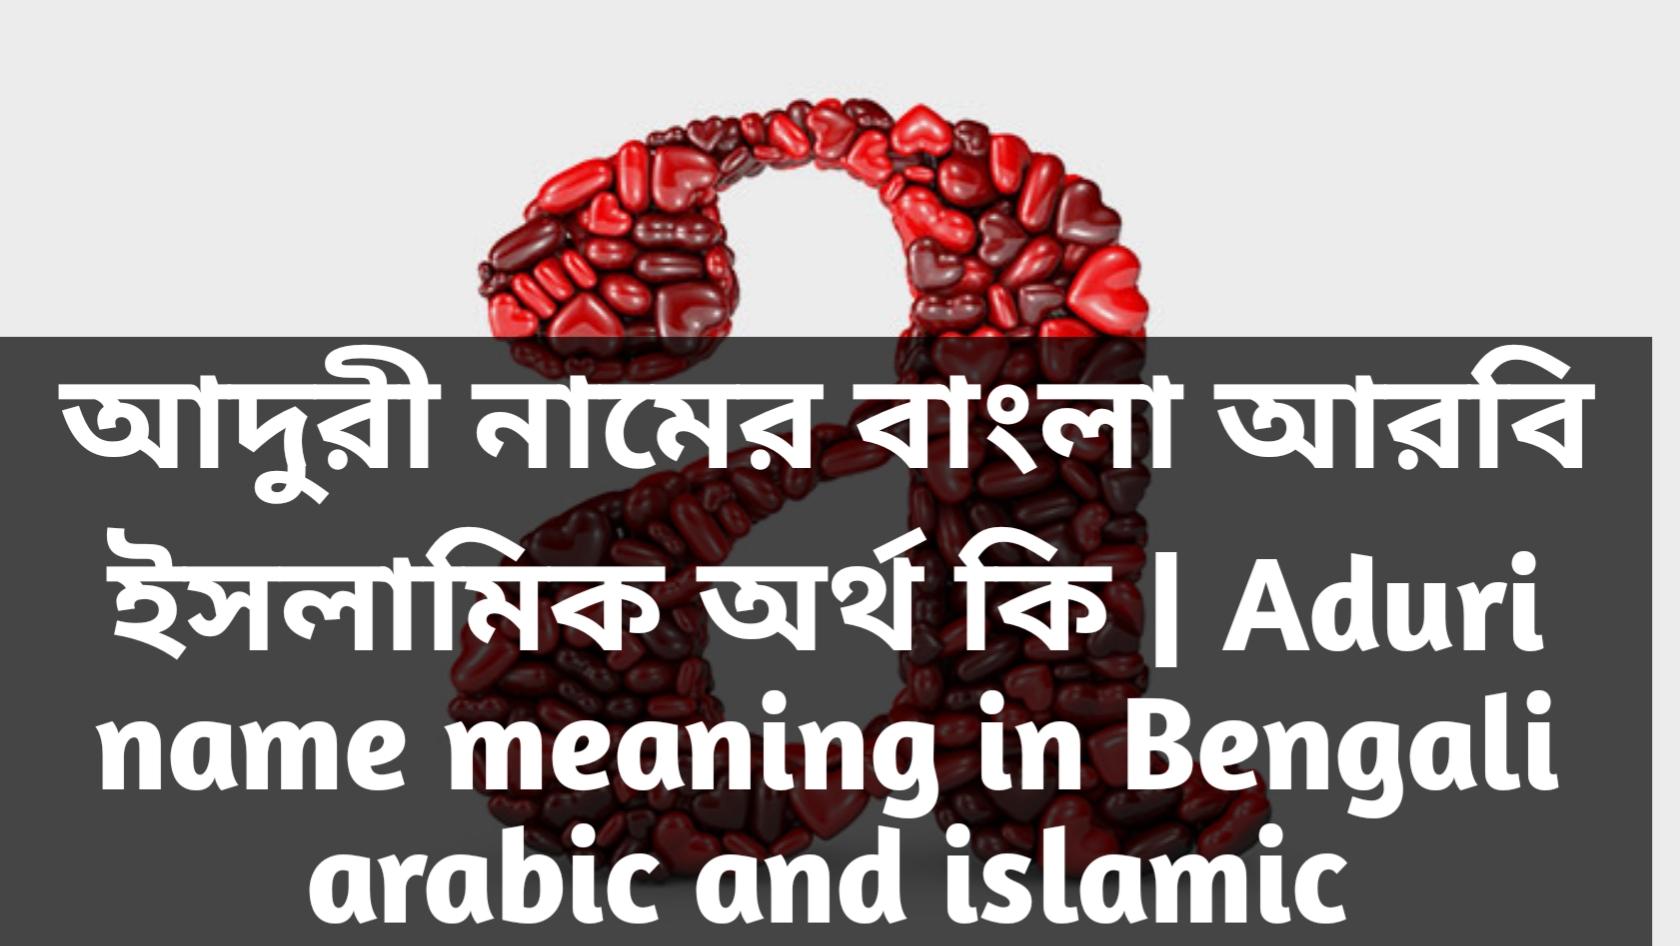 Aduri name meaning in Bengali, আদুরী নামের অর্থ কি, আদুরী নামের বাংলা অর্থ কি, আদুরী নামের ইসলামিক অর্থ কি,